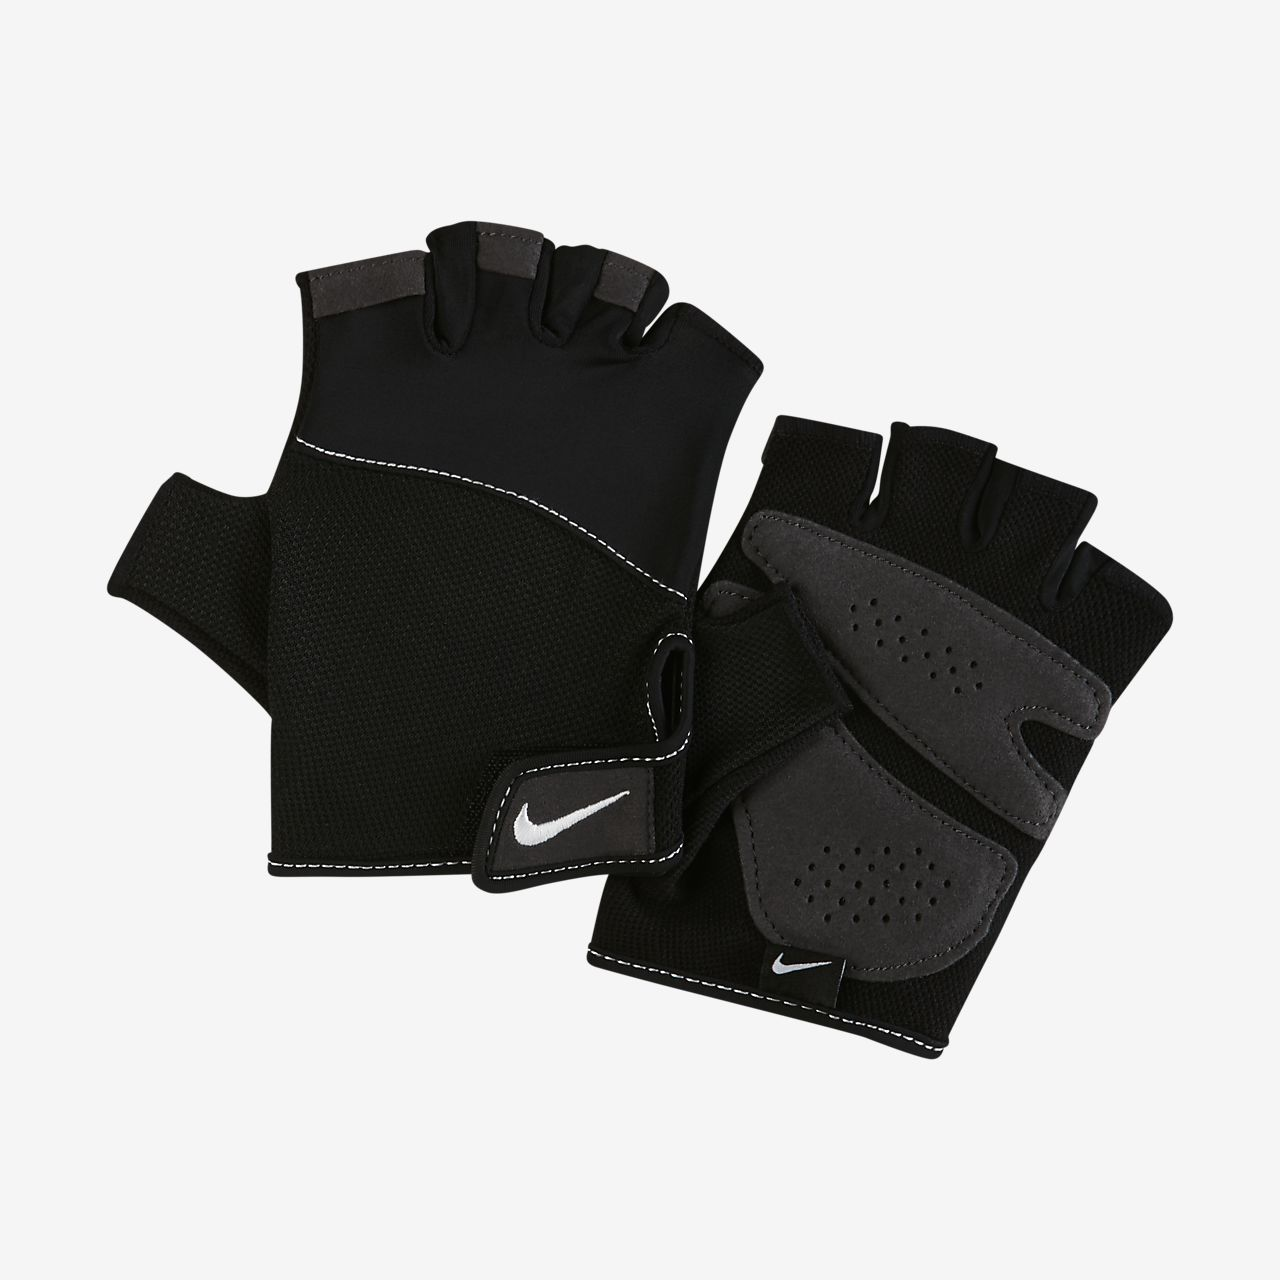 Nike Elemental Fitness Guants d'entrenament - Dona